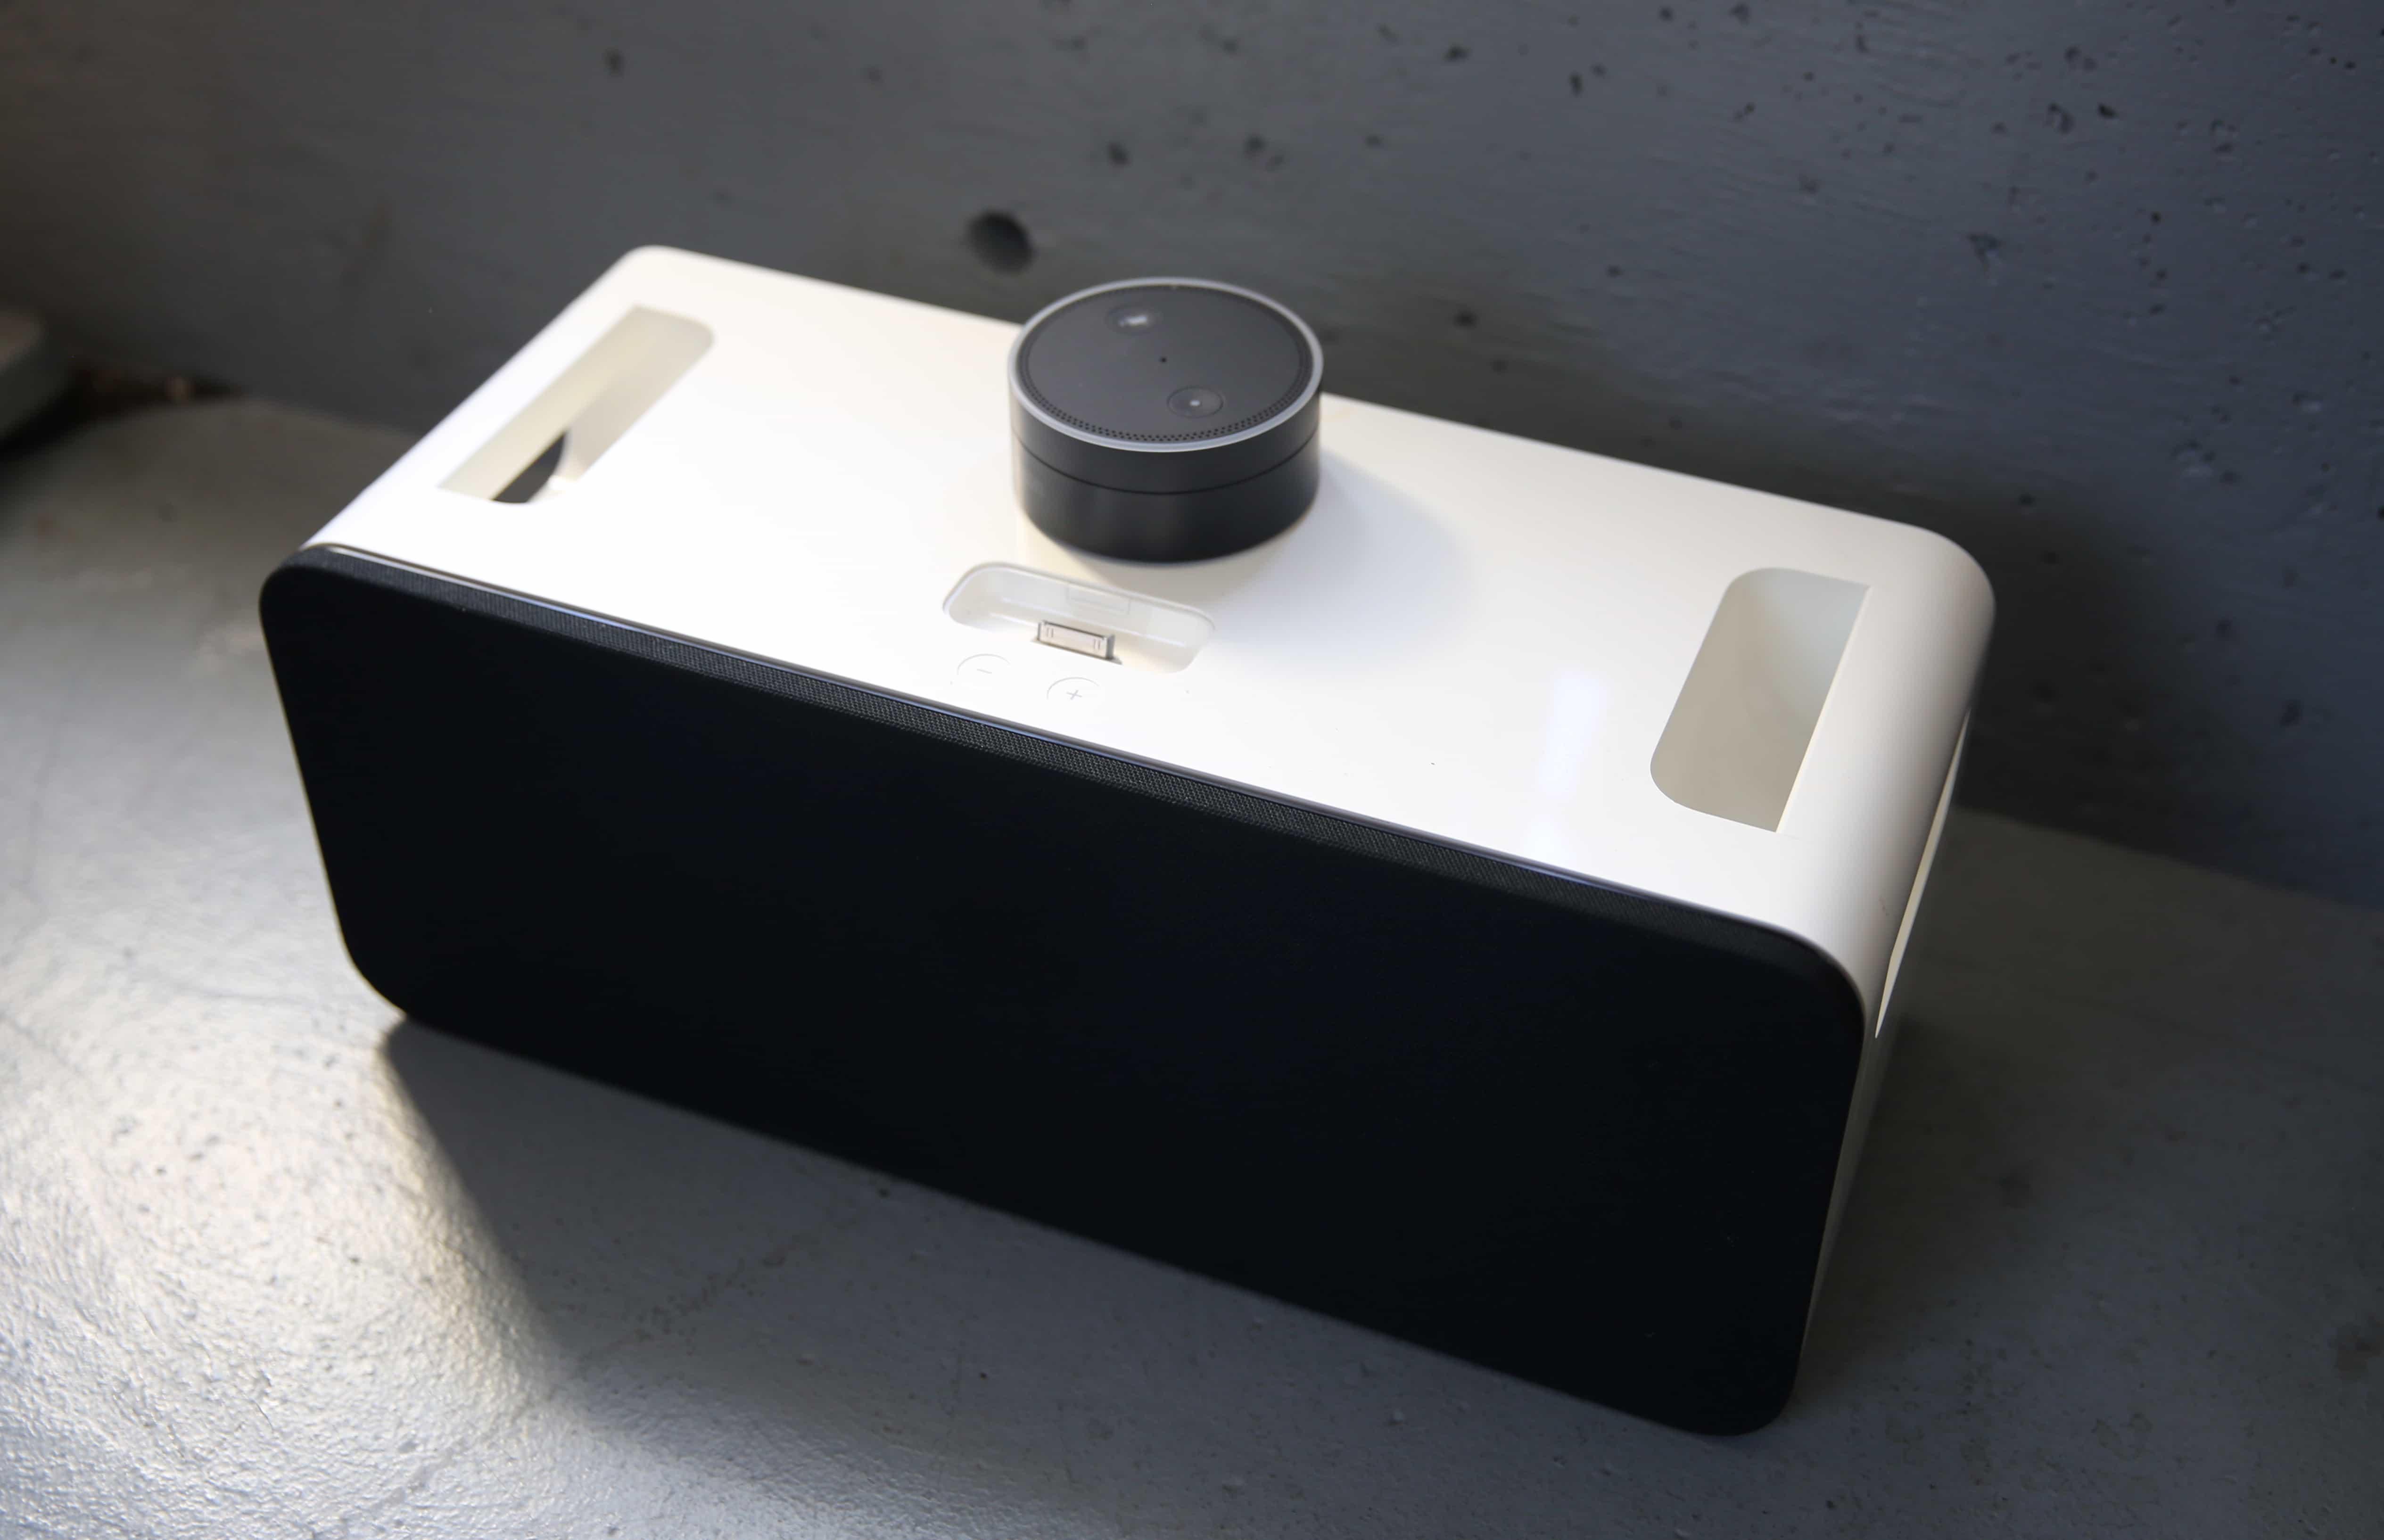 iPod Hi-Fi with Amazon Alexa Dot